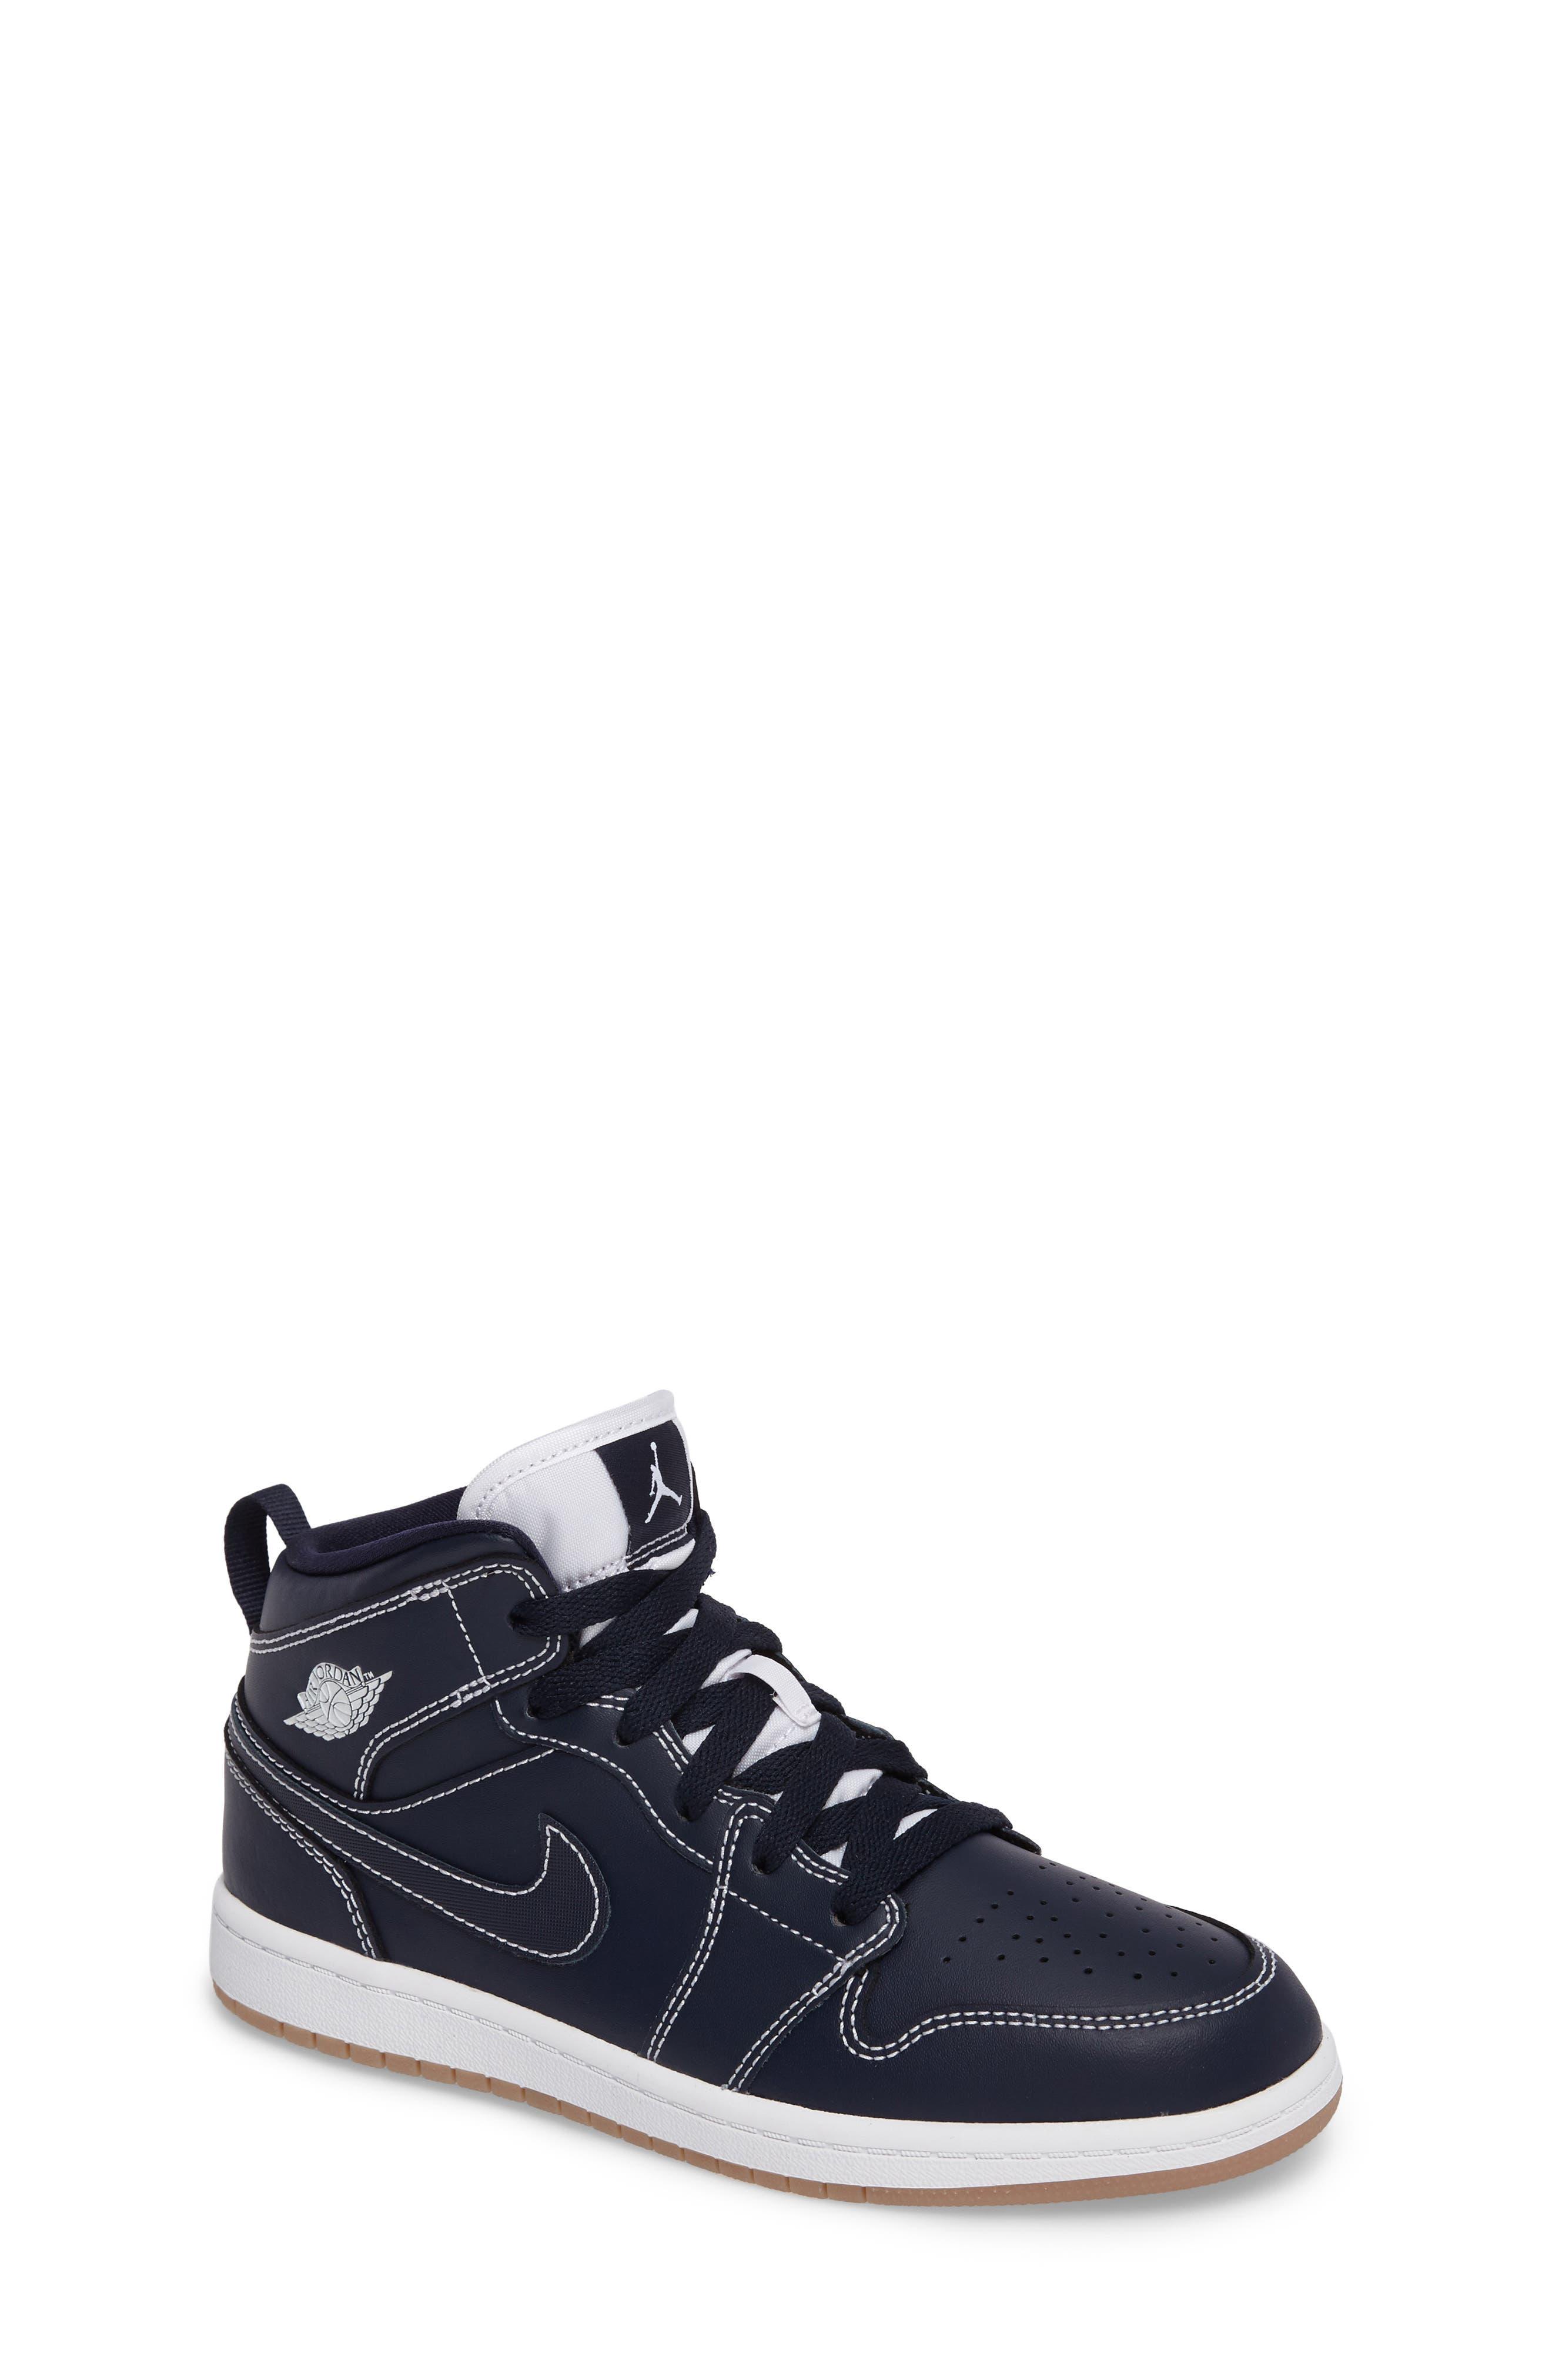 'Air Jordan 1' Mid Sneaker,                         Main,                         color, Obsidian/ White